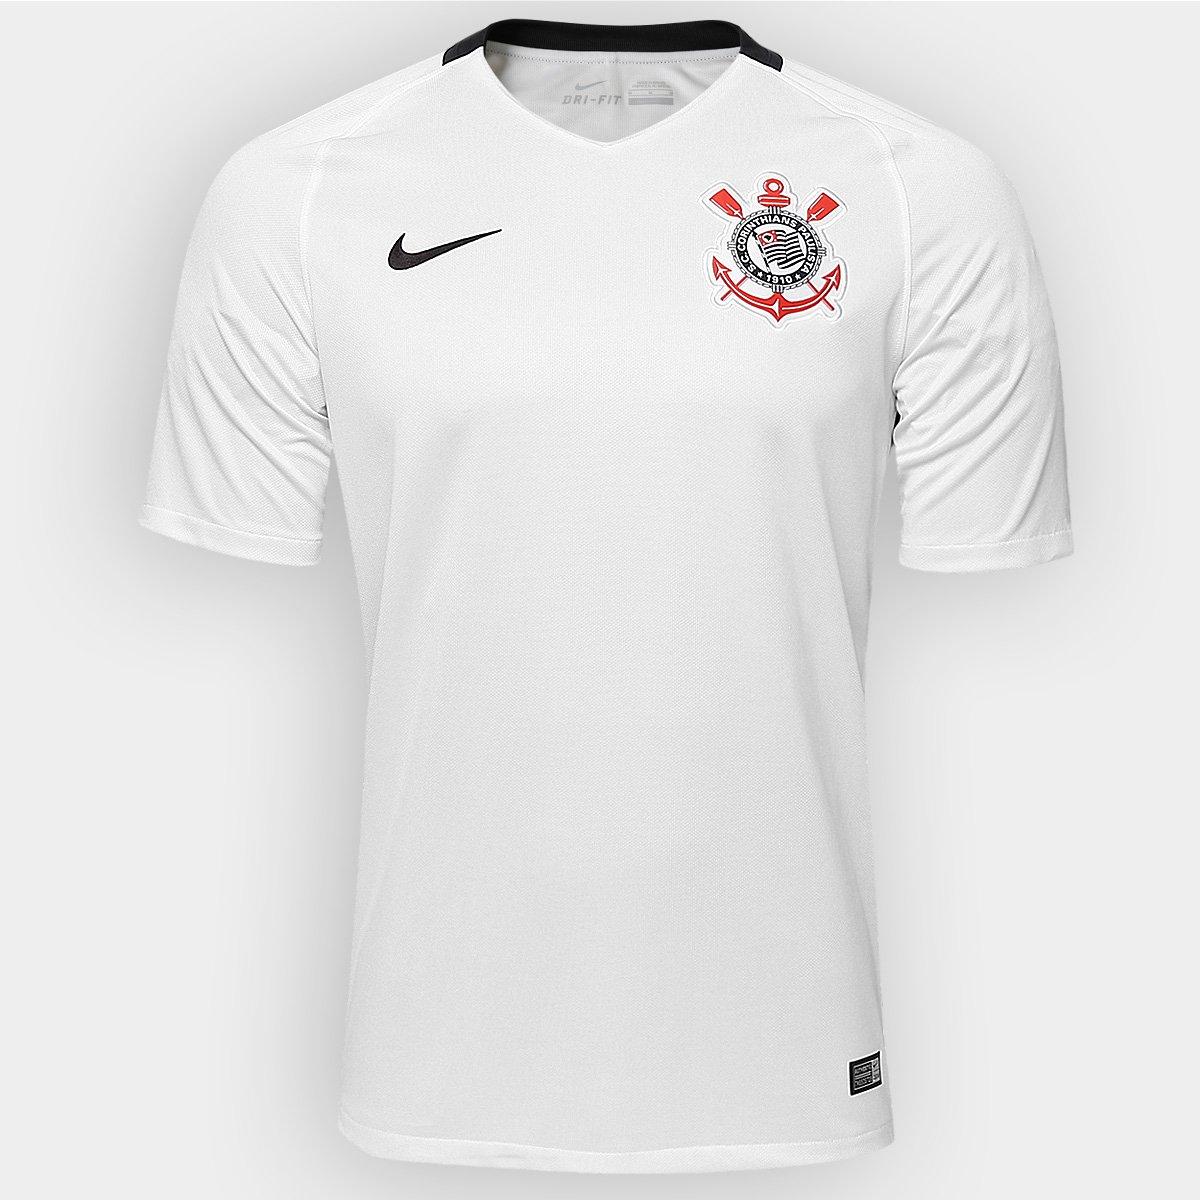 17f670f0ae405 Camisa Corinthians I 2016 s nº Torcedor Nike Masculina - Compre Agora